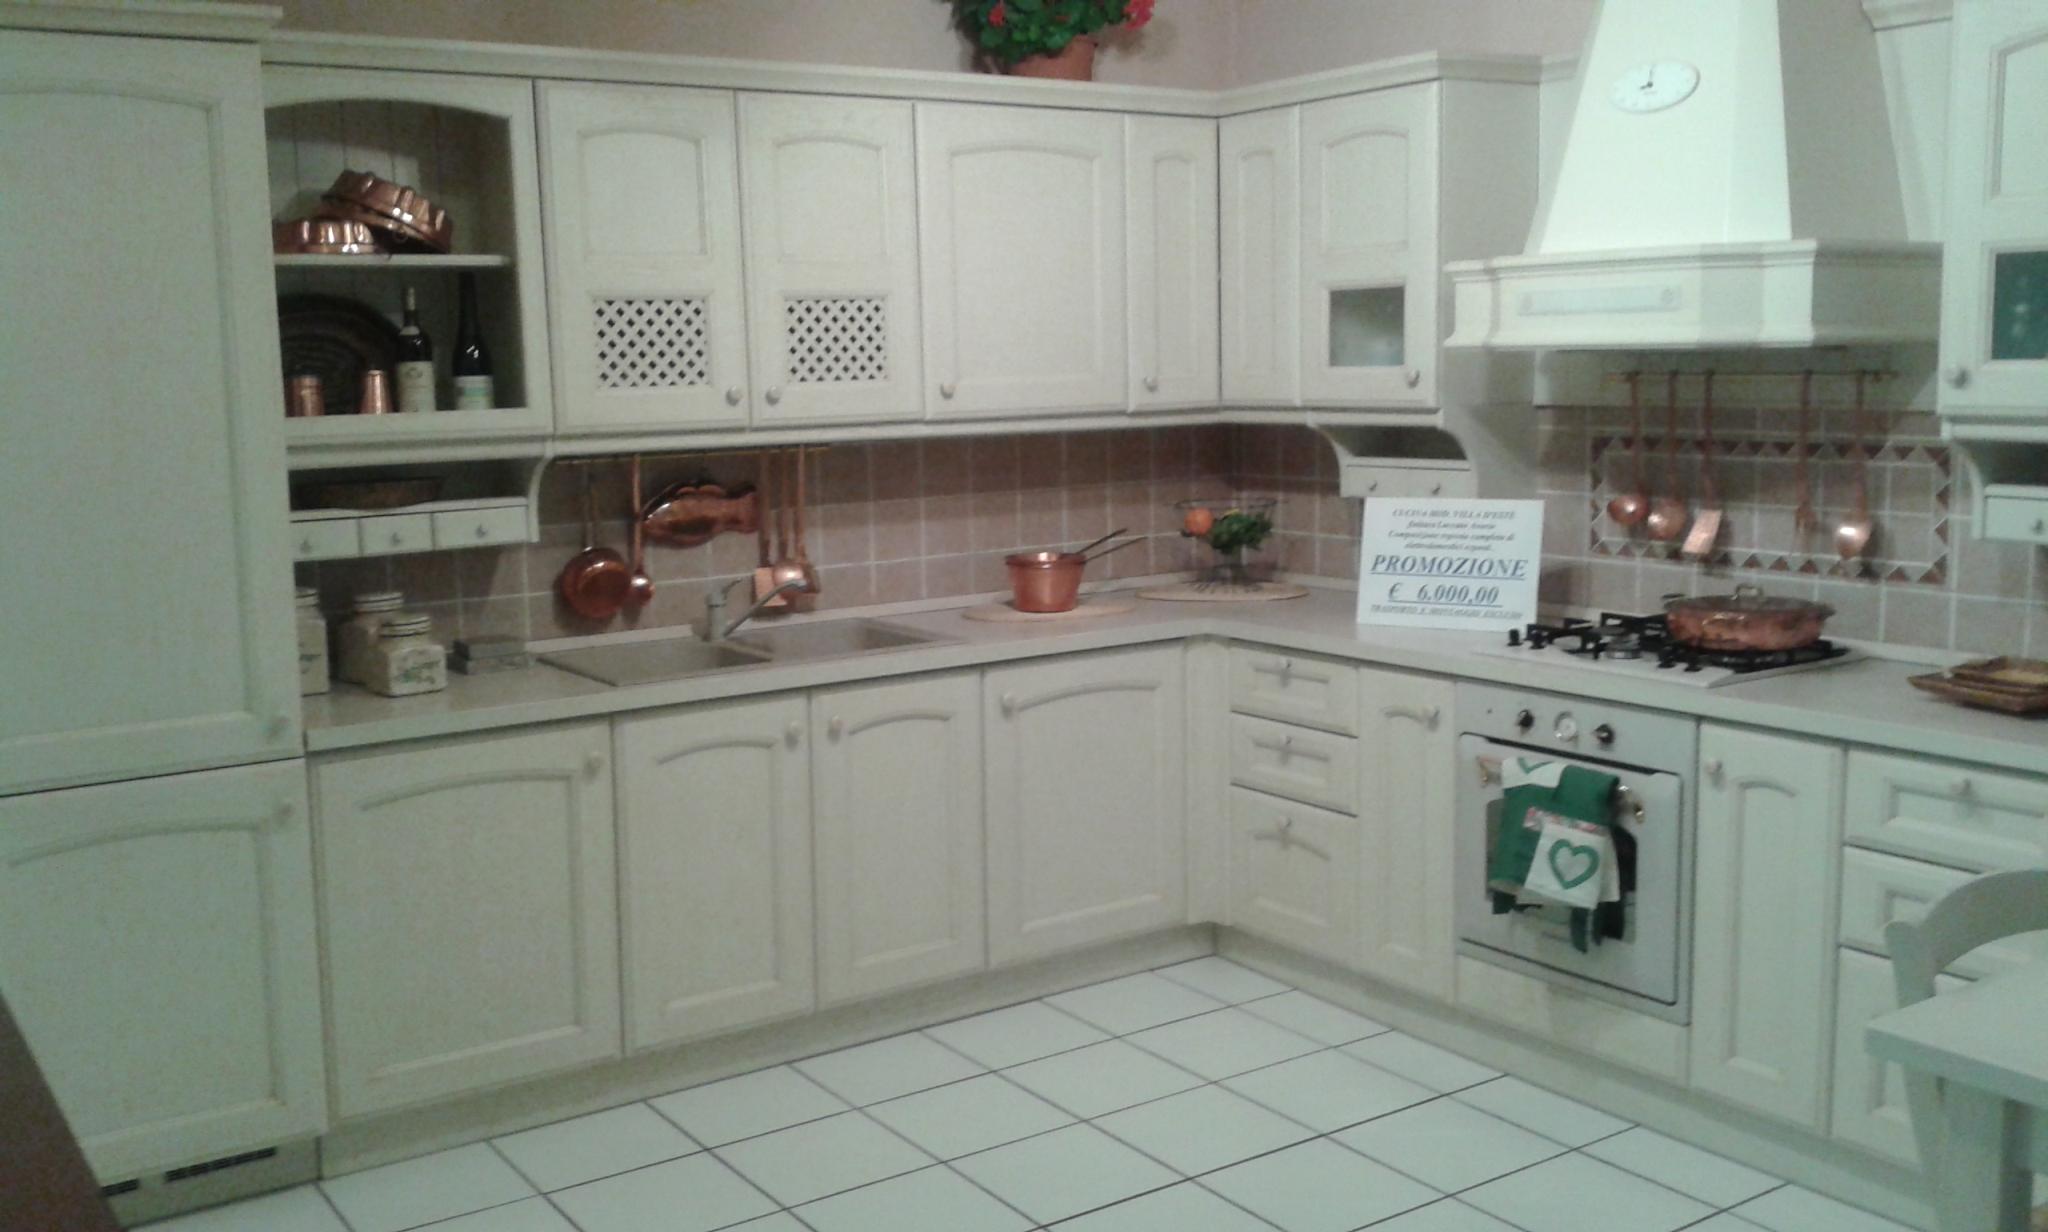 Cucina veneta cucine veneta cucine modello villa d 39 este - Cucine color avorio ...